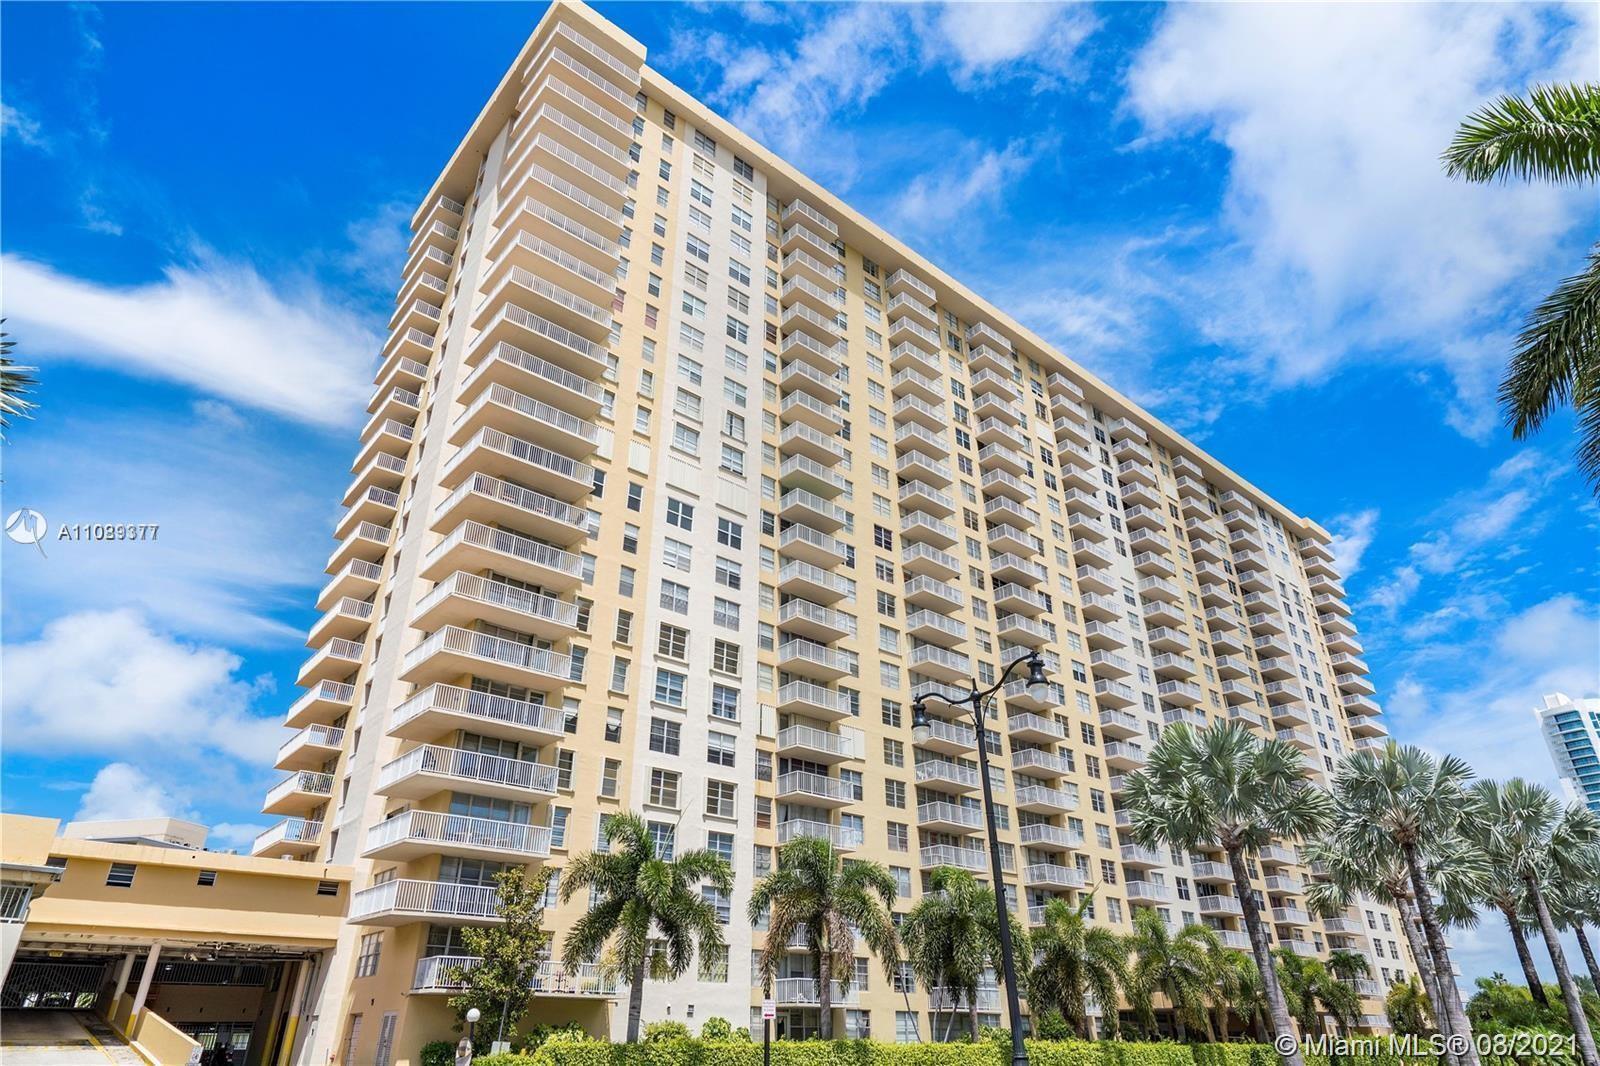 Winston Tower 400 #314 - 231 174th St #314, Sunny Isles Beach, FL 33160